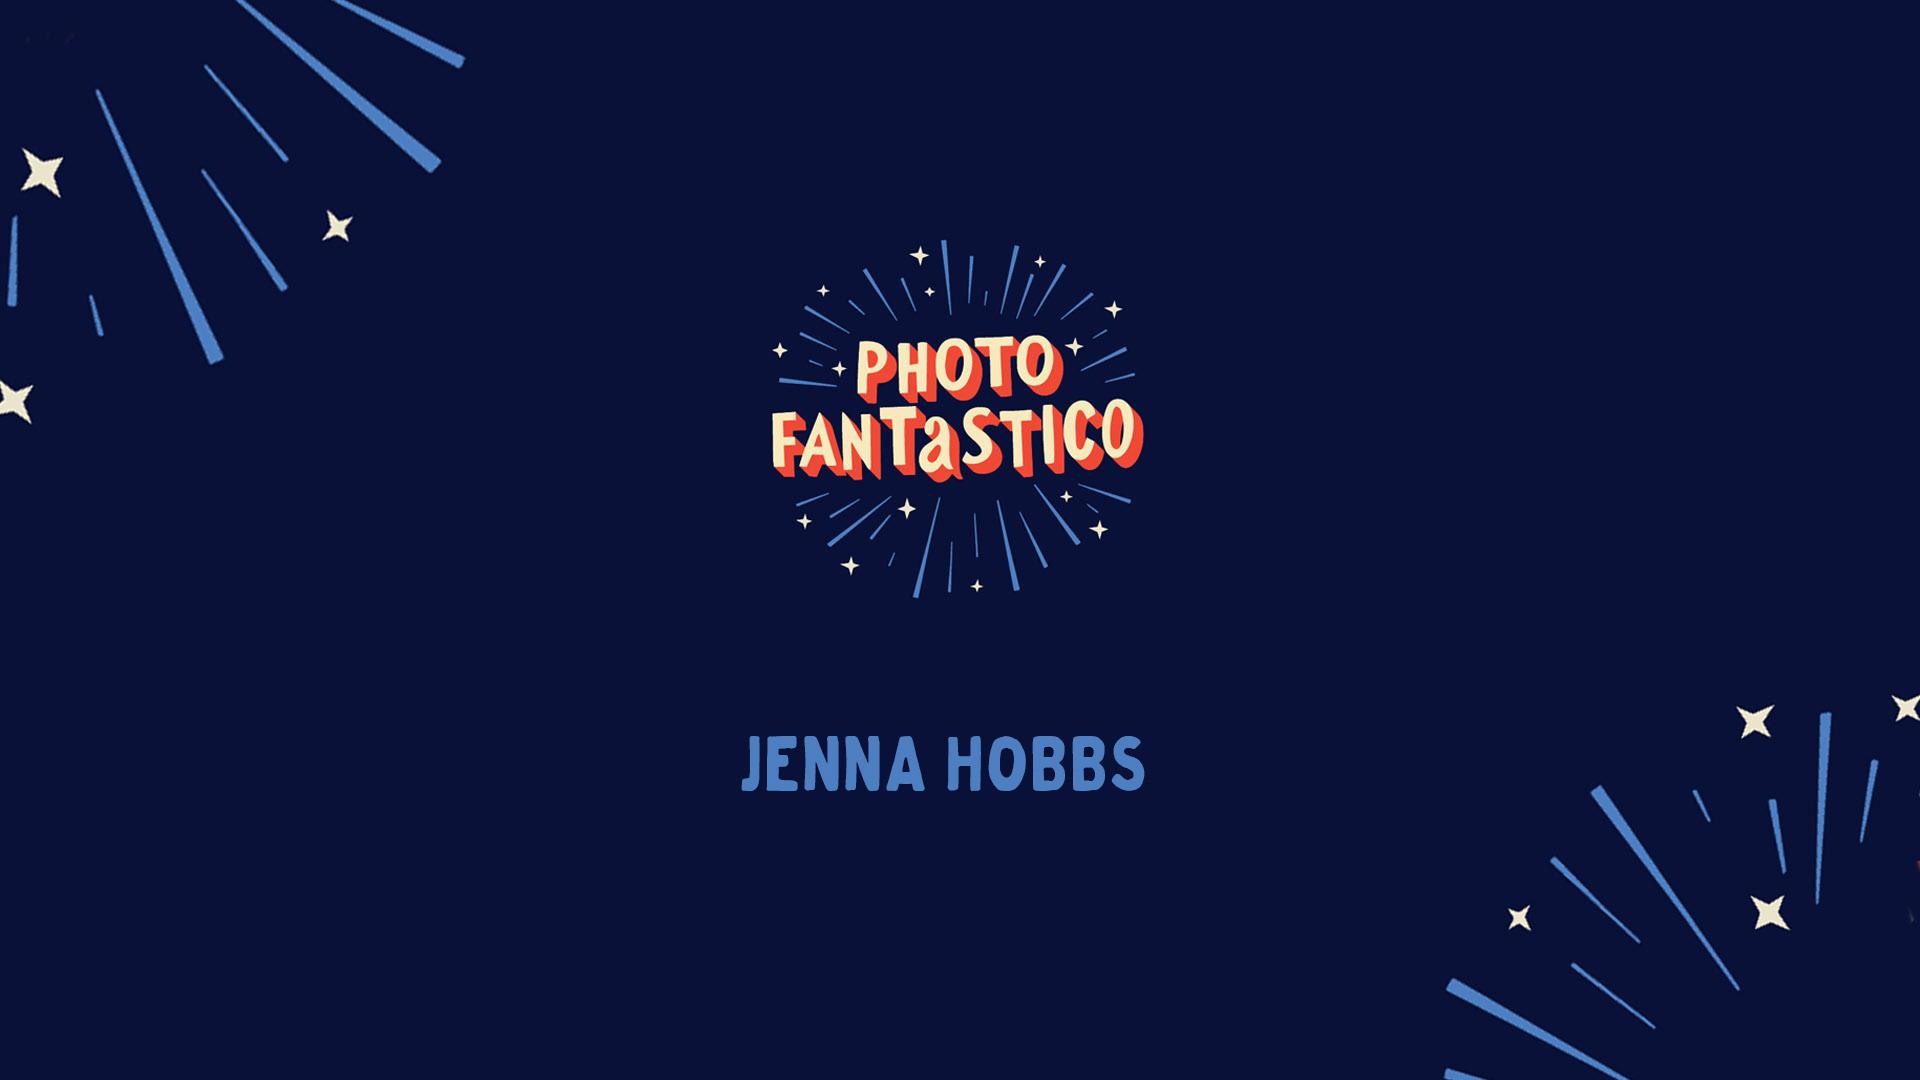 Jenna Hobbs